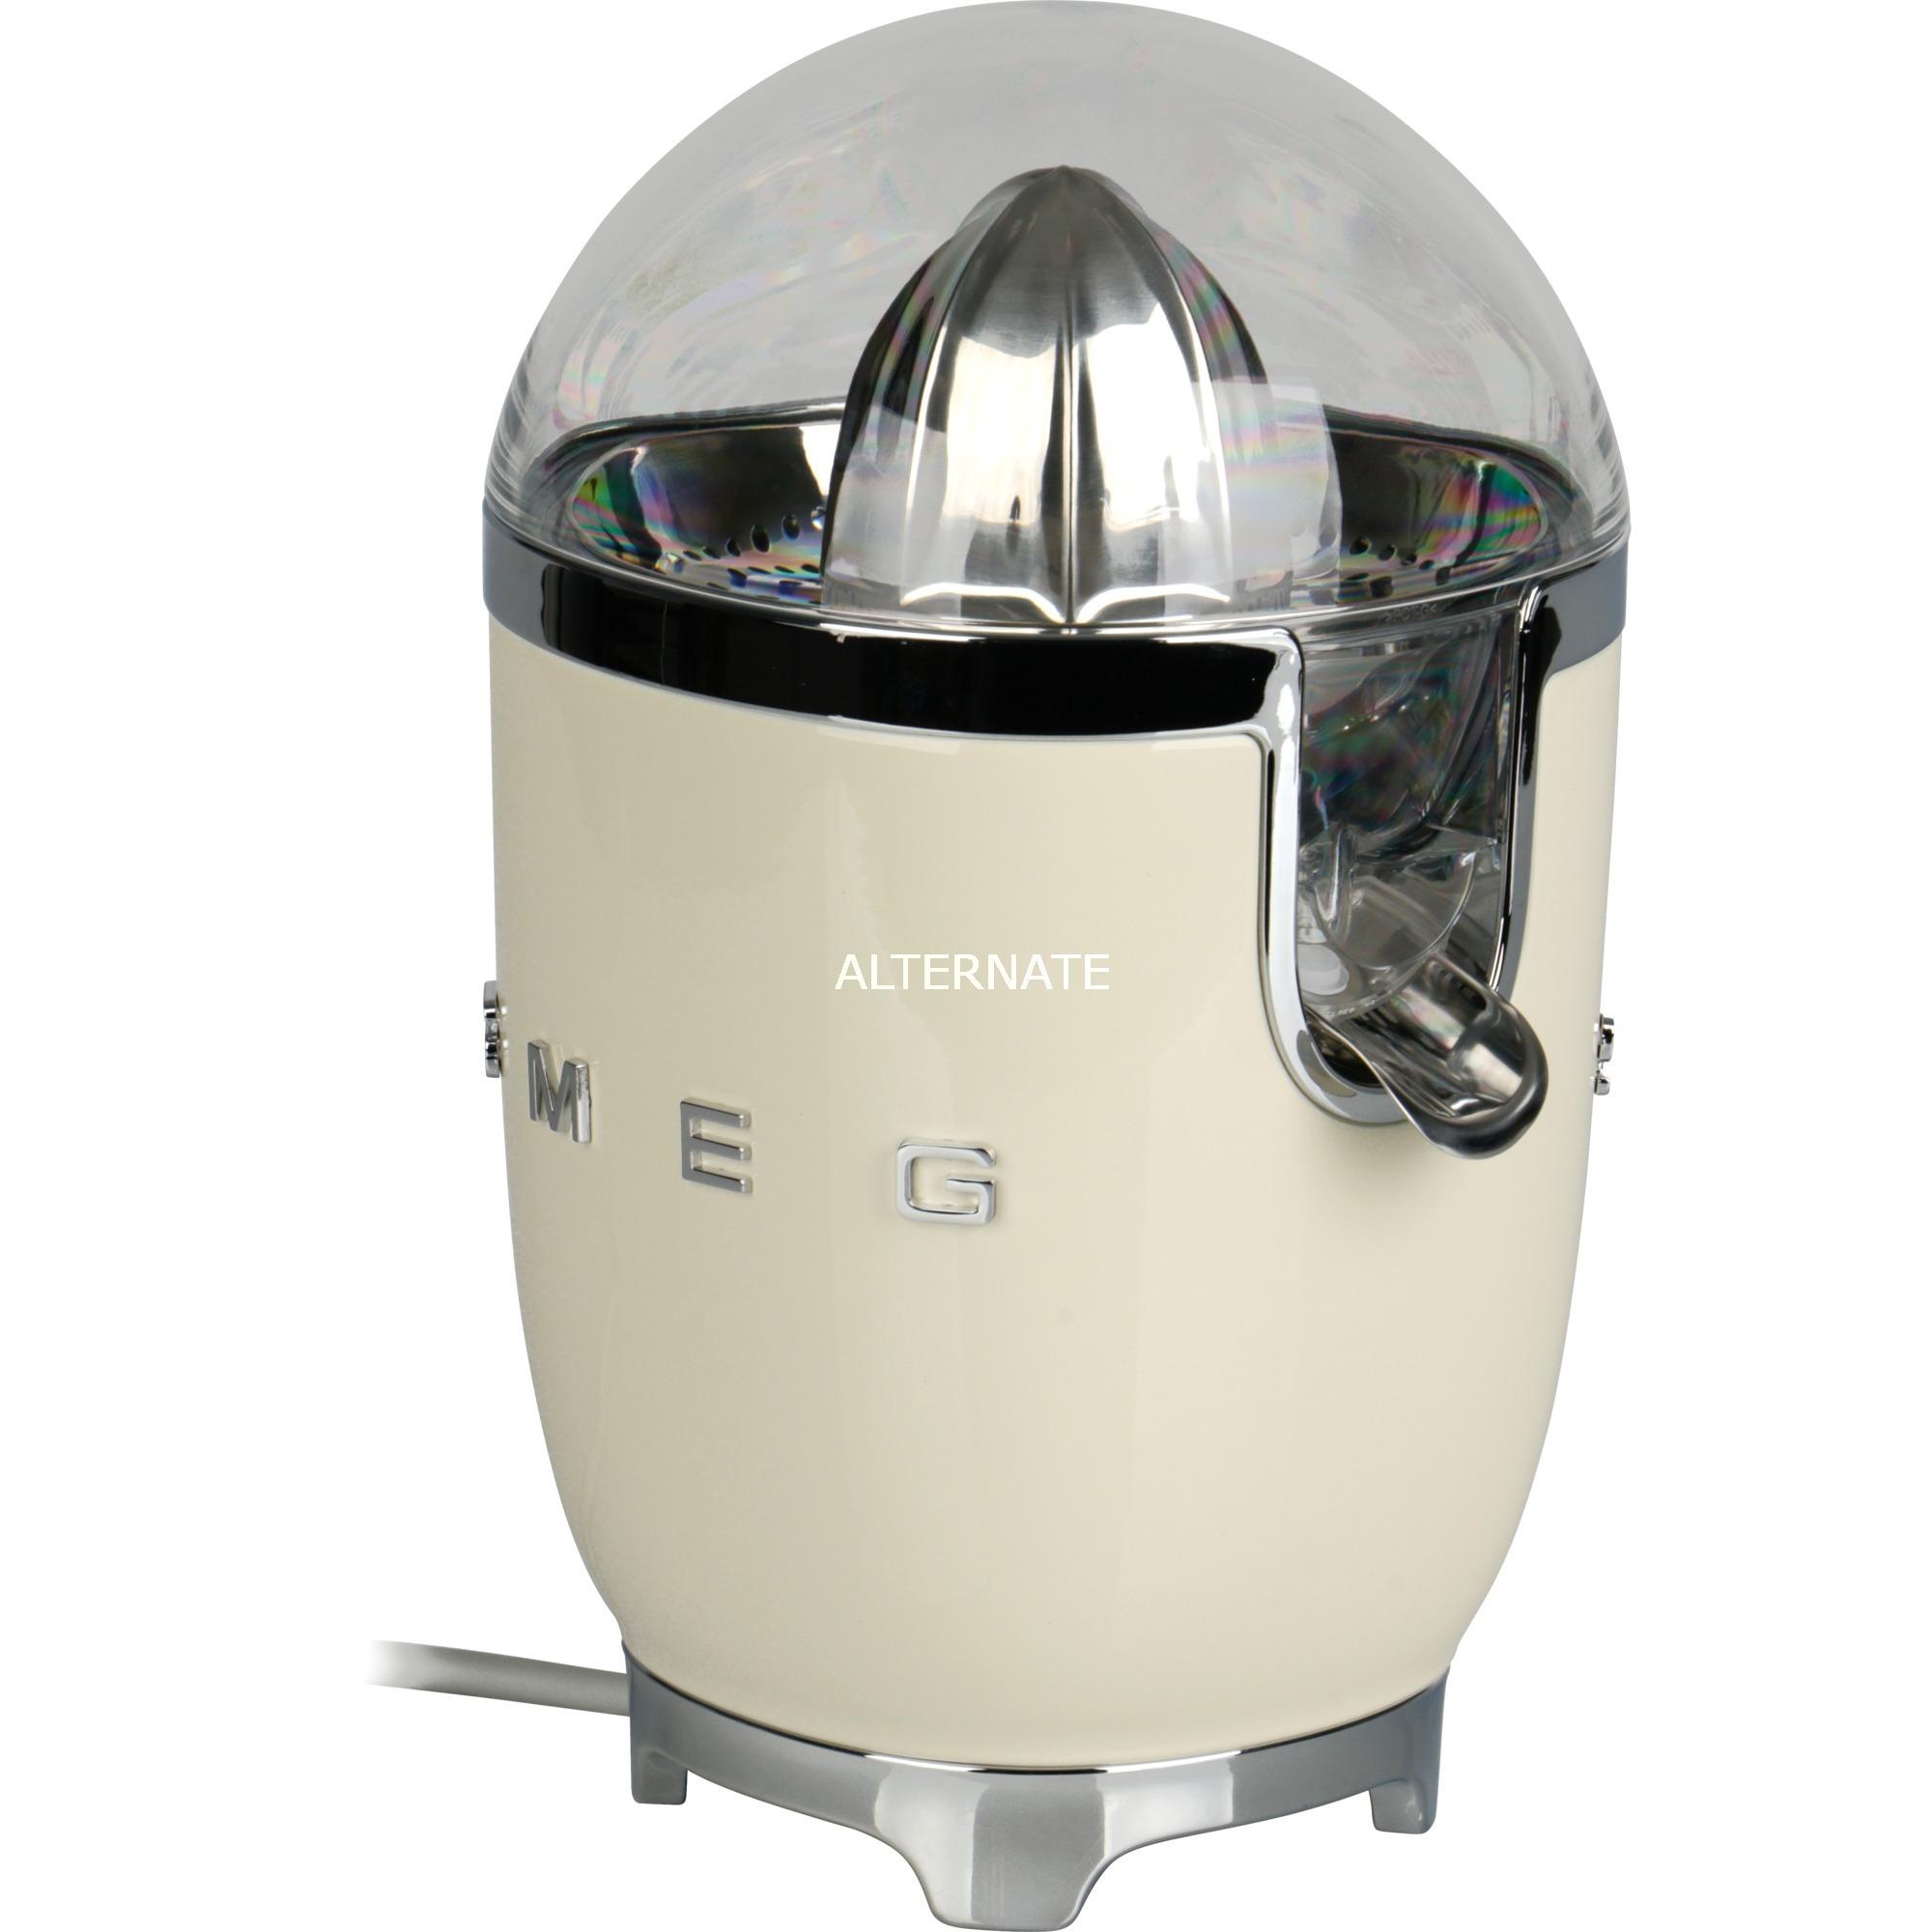 CJF01CREU prensa de cítricos eléctricos Crema de color 70 W, Exprimidor